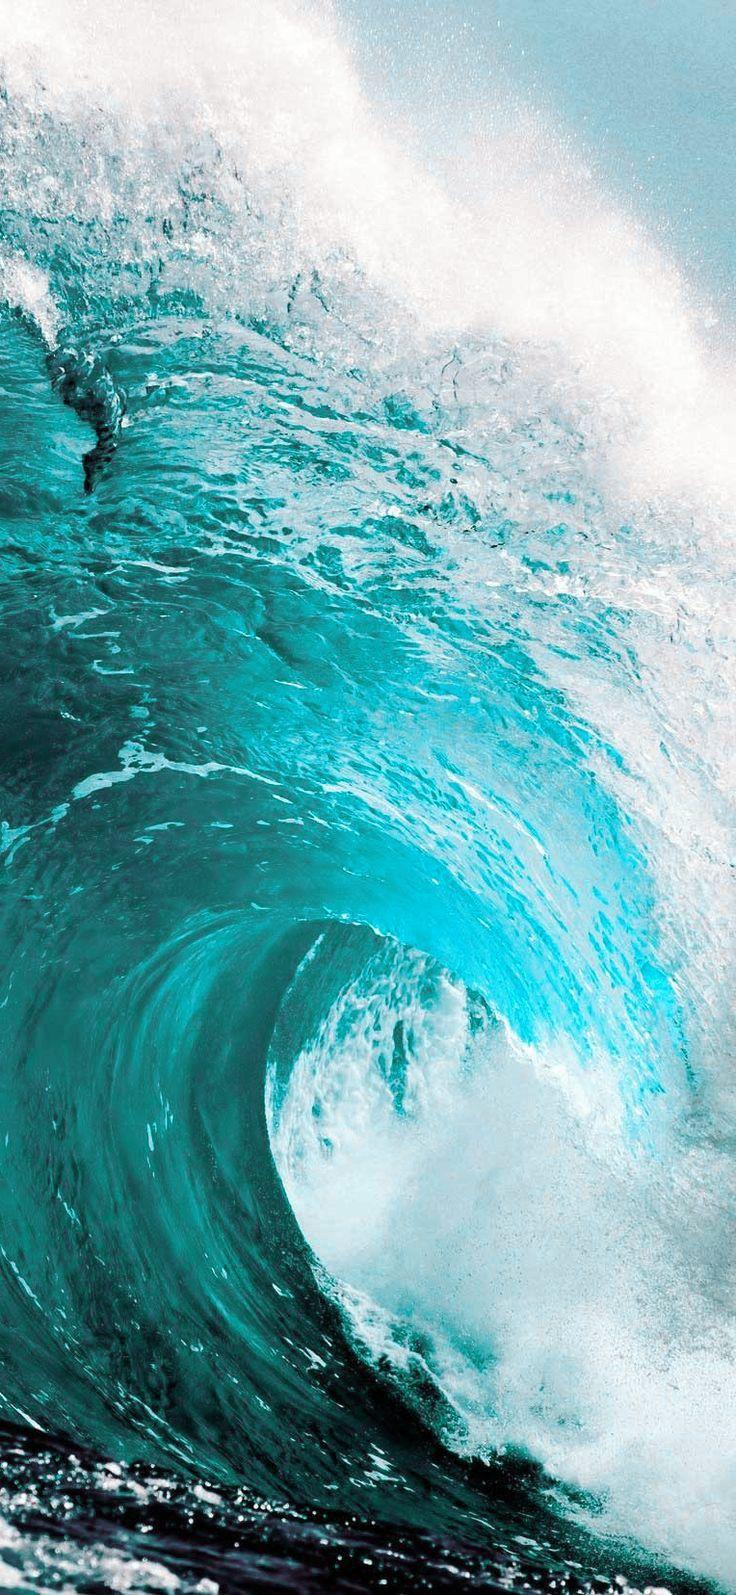 Beach Wave Lockscreen In 2021 Ocean Backgrounds Phone Backgrounds Phone Art Beach mobile wallpaper hd sea images